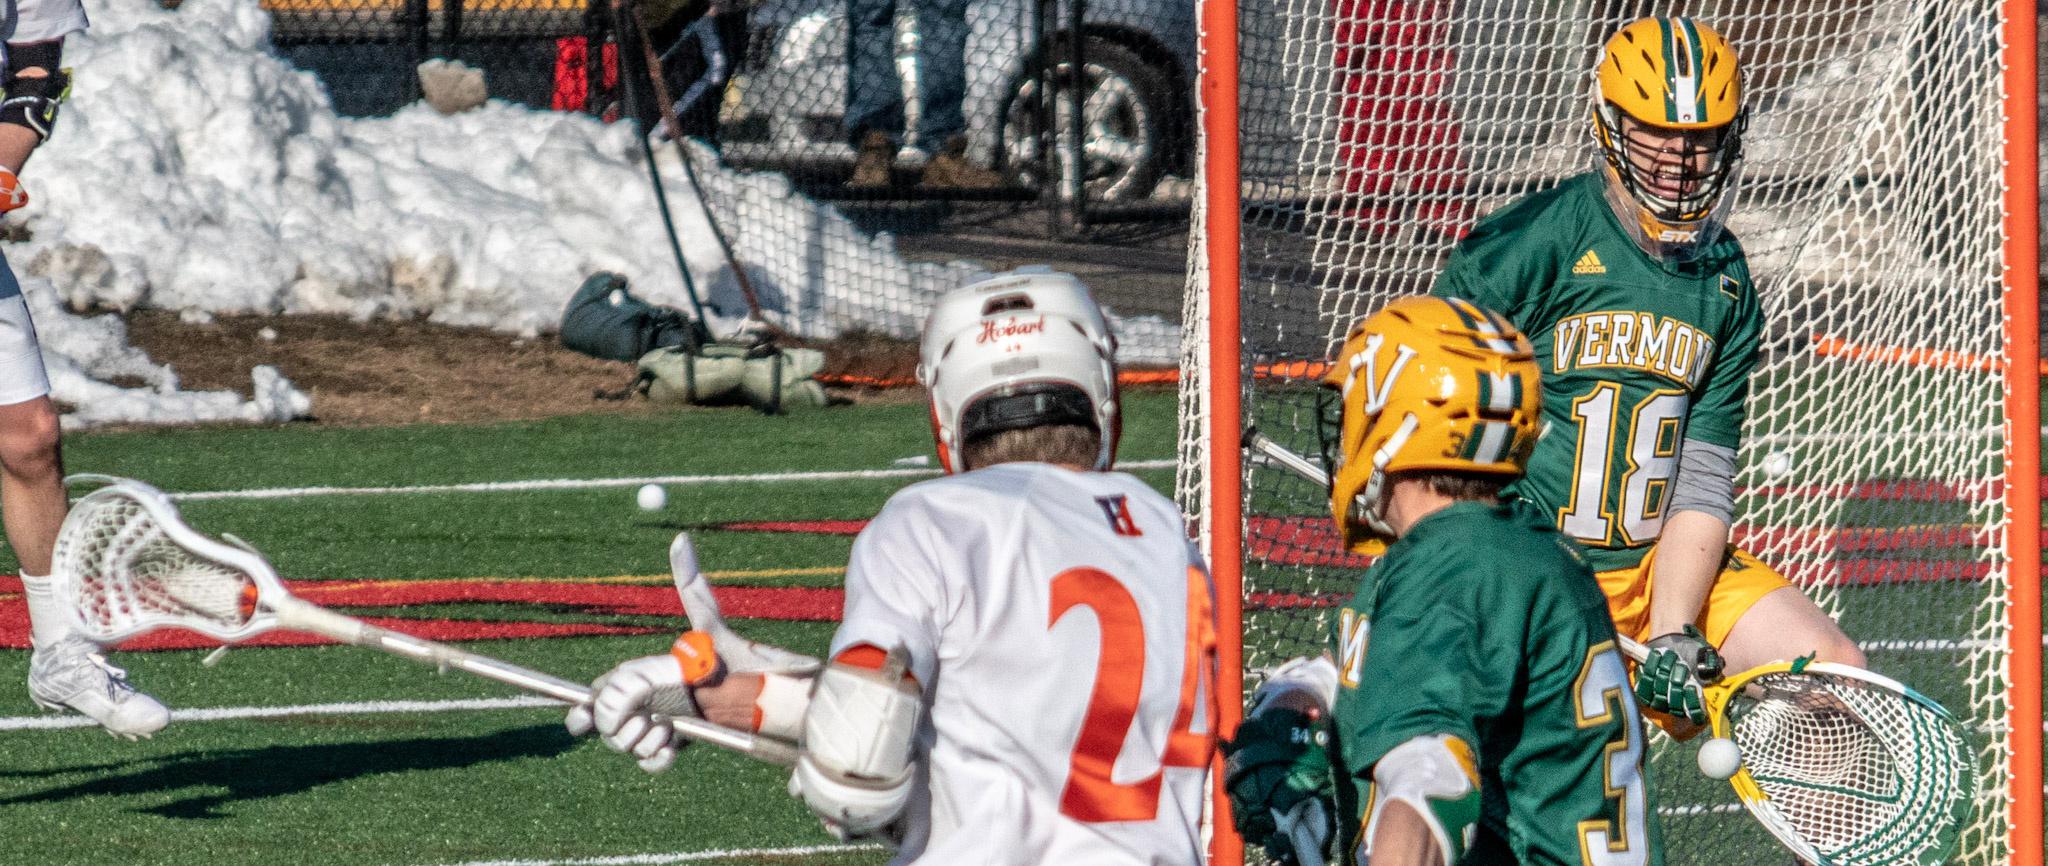 Minnesota's Nick Washuta Vermont Lacrosse